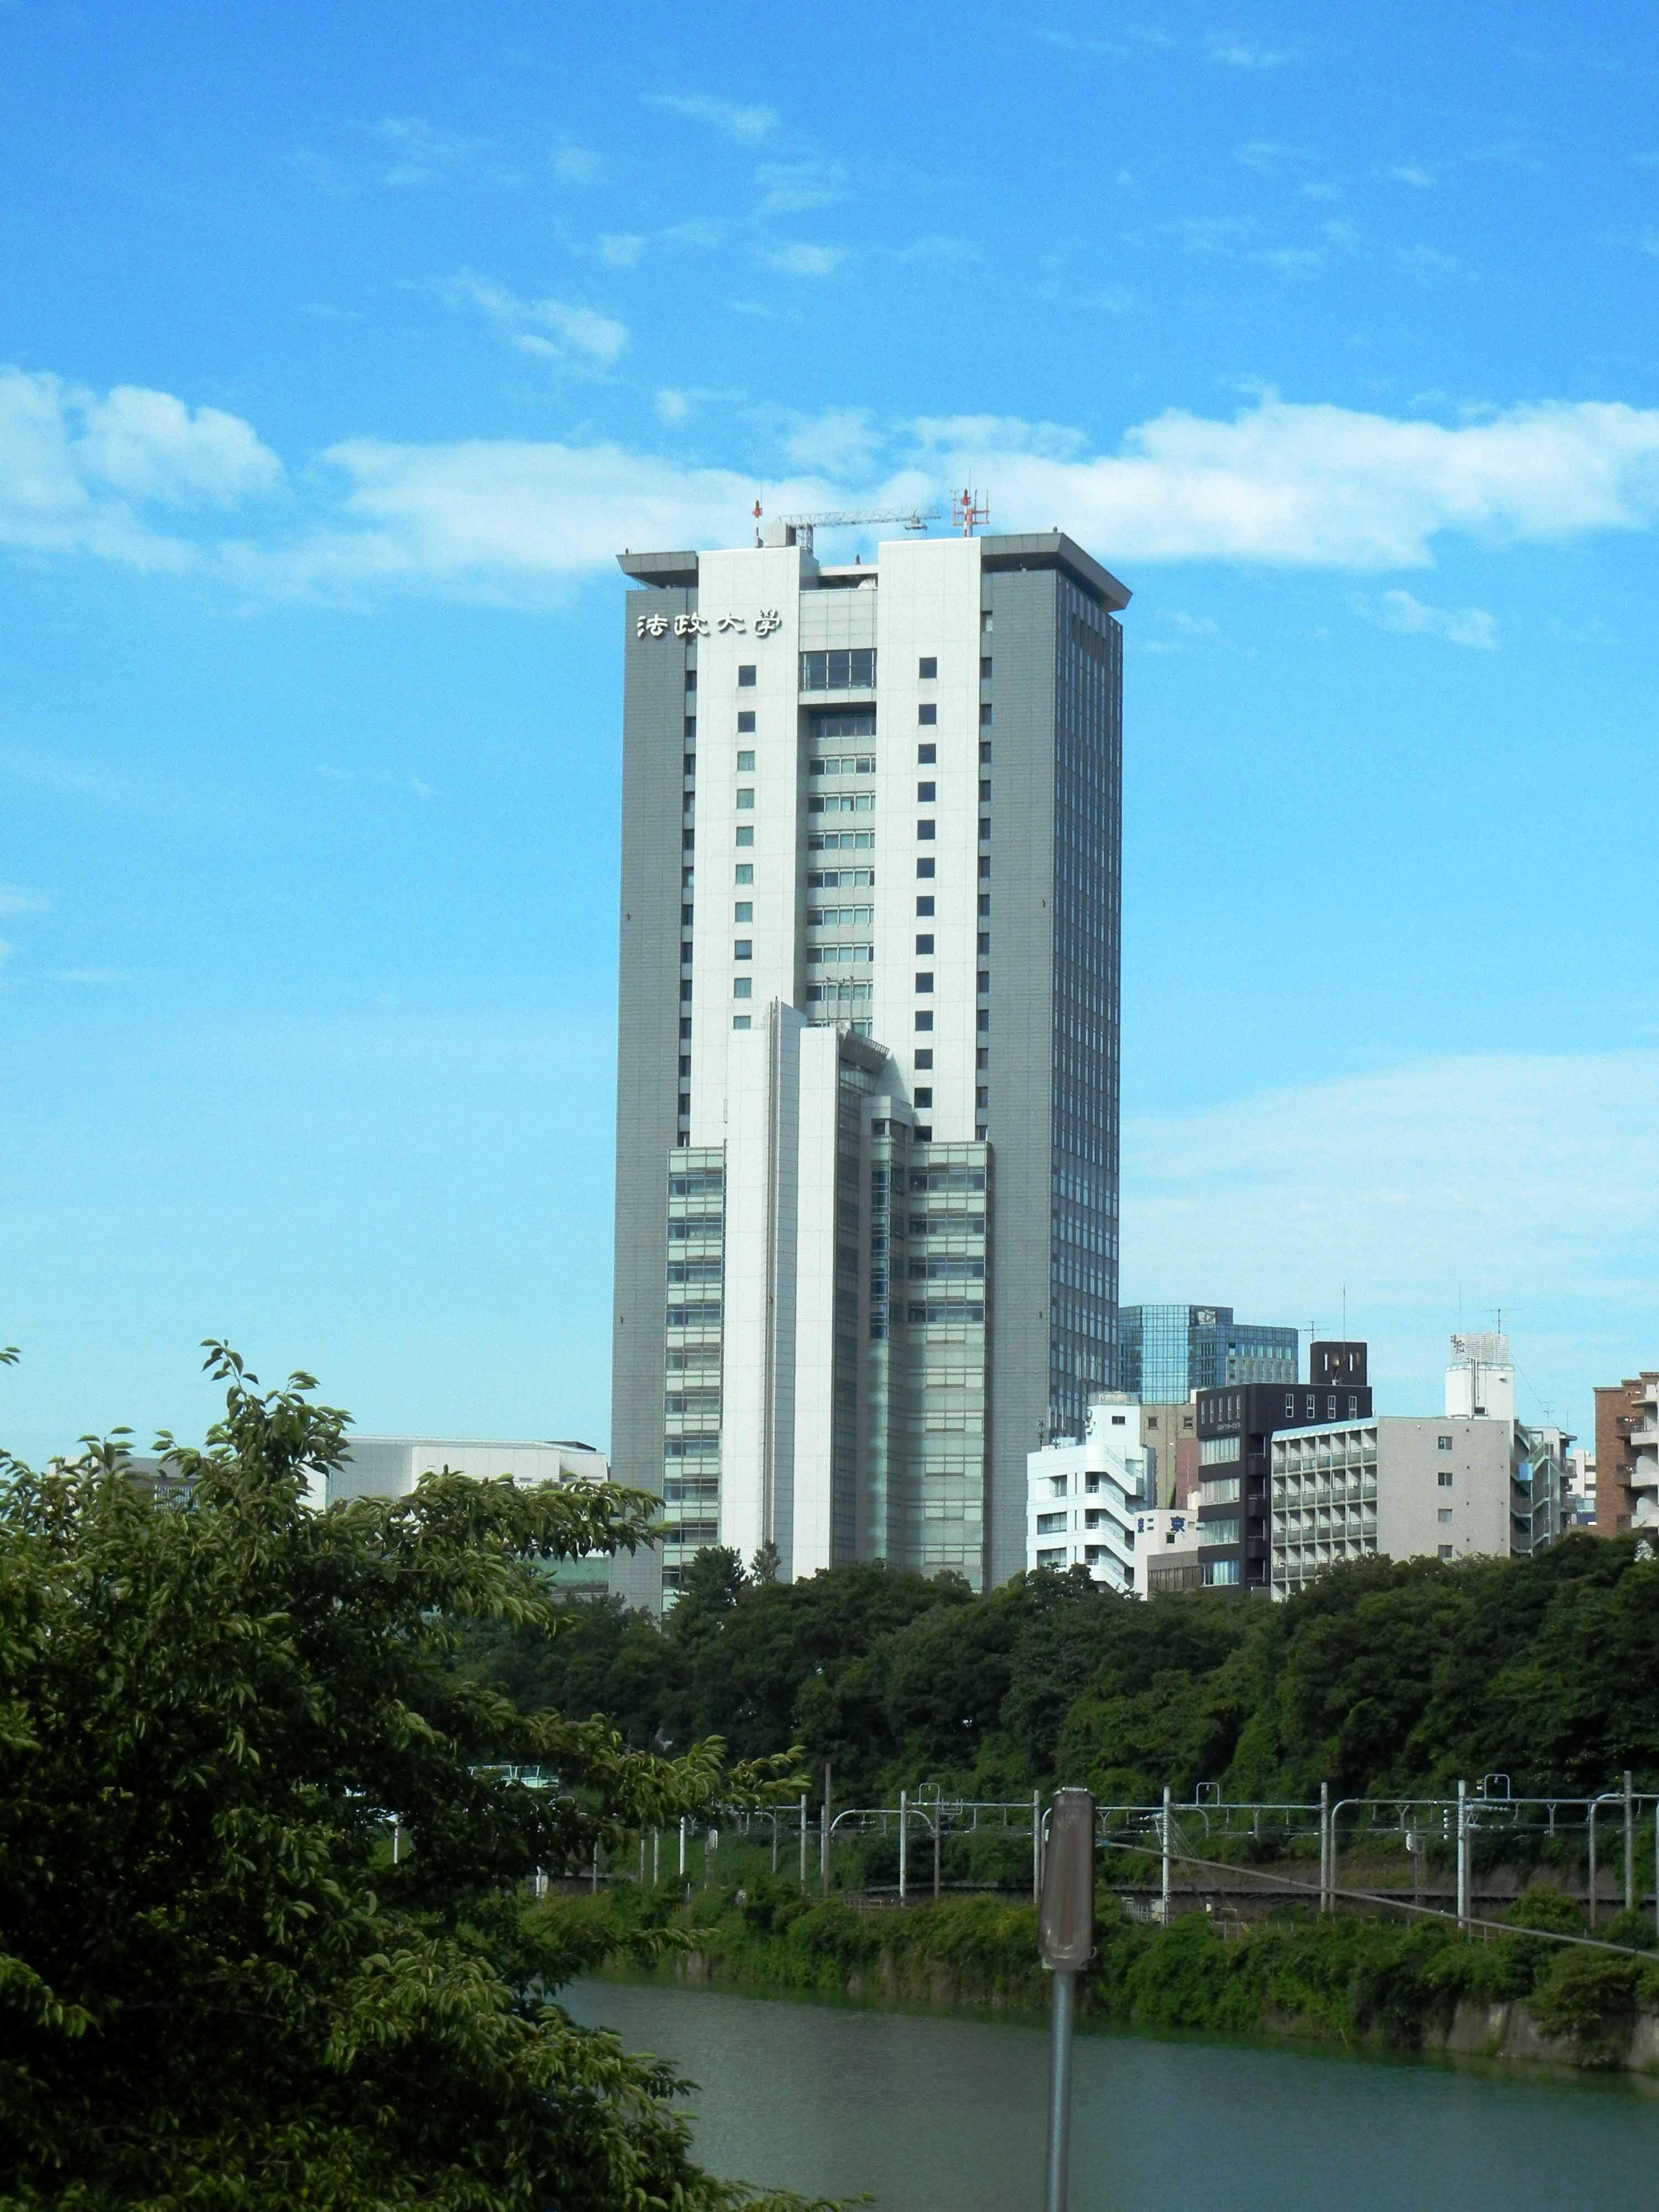 Hosei University Boissonade Tower by ペン太